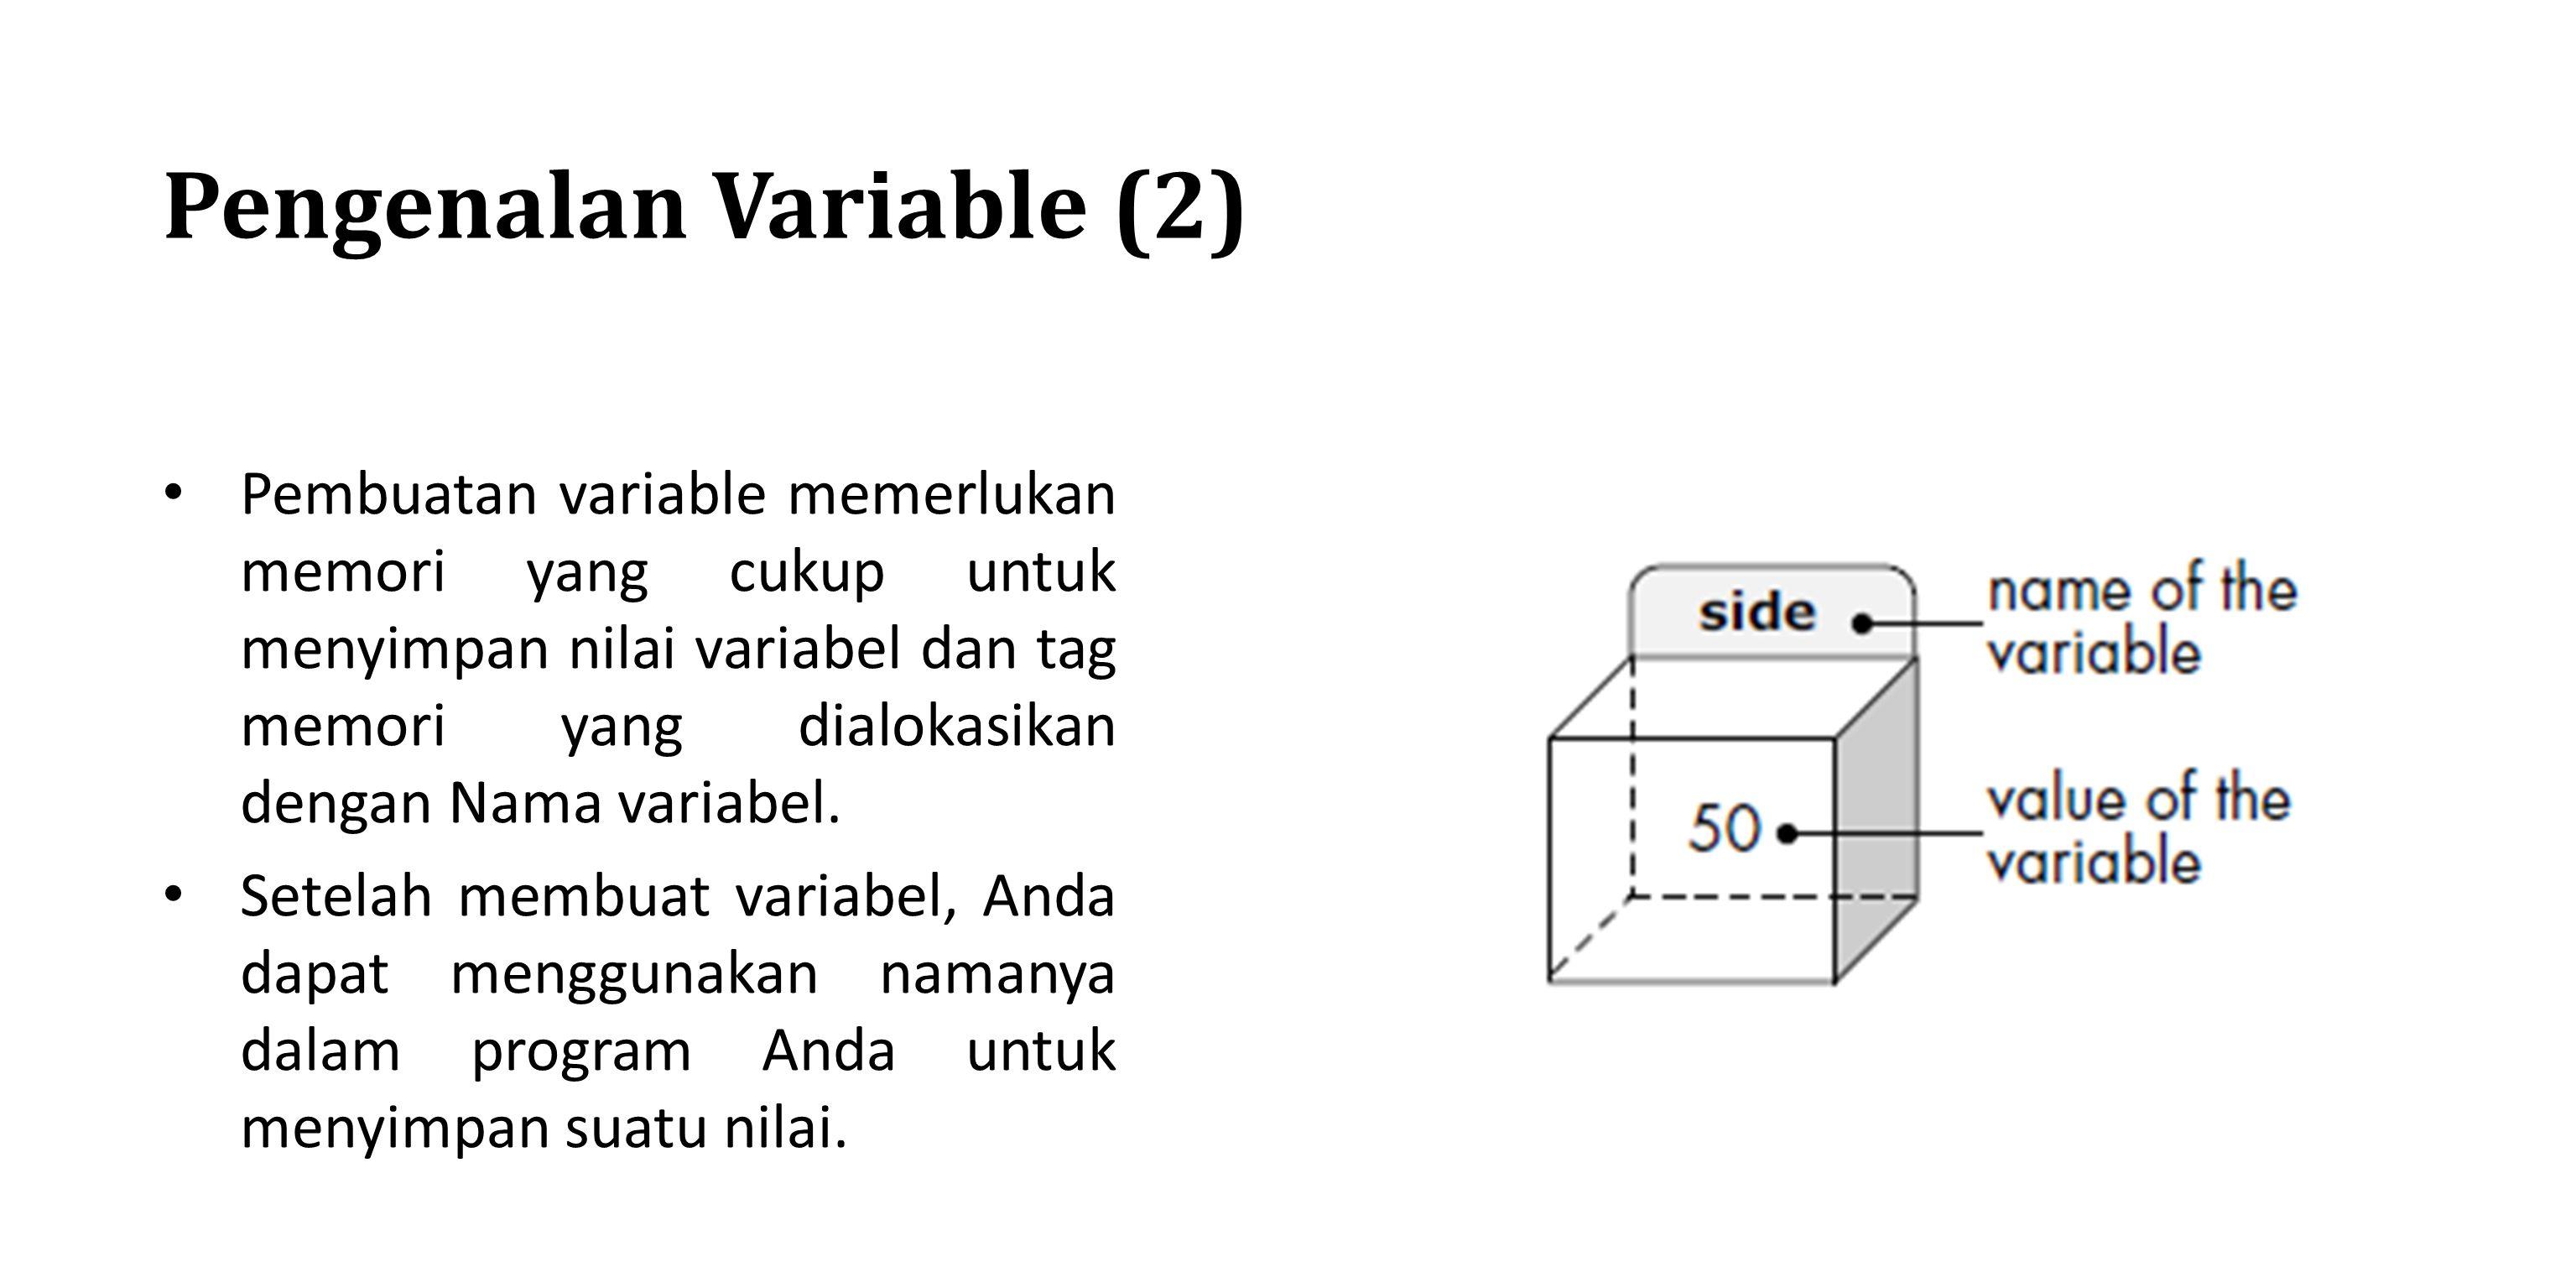 Pengenalan Variable (2) Pembuatan variable memerlukan memori yang cukup untuk menyimpan nilai variabel dan tag memori yang dialokasikan dengan Nama va